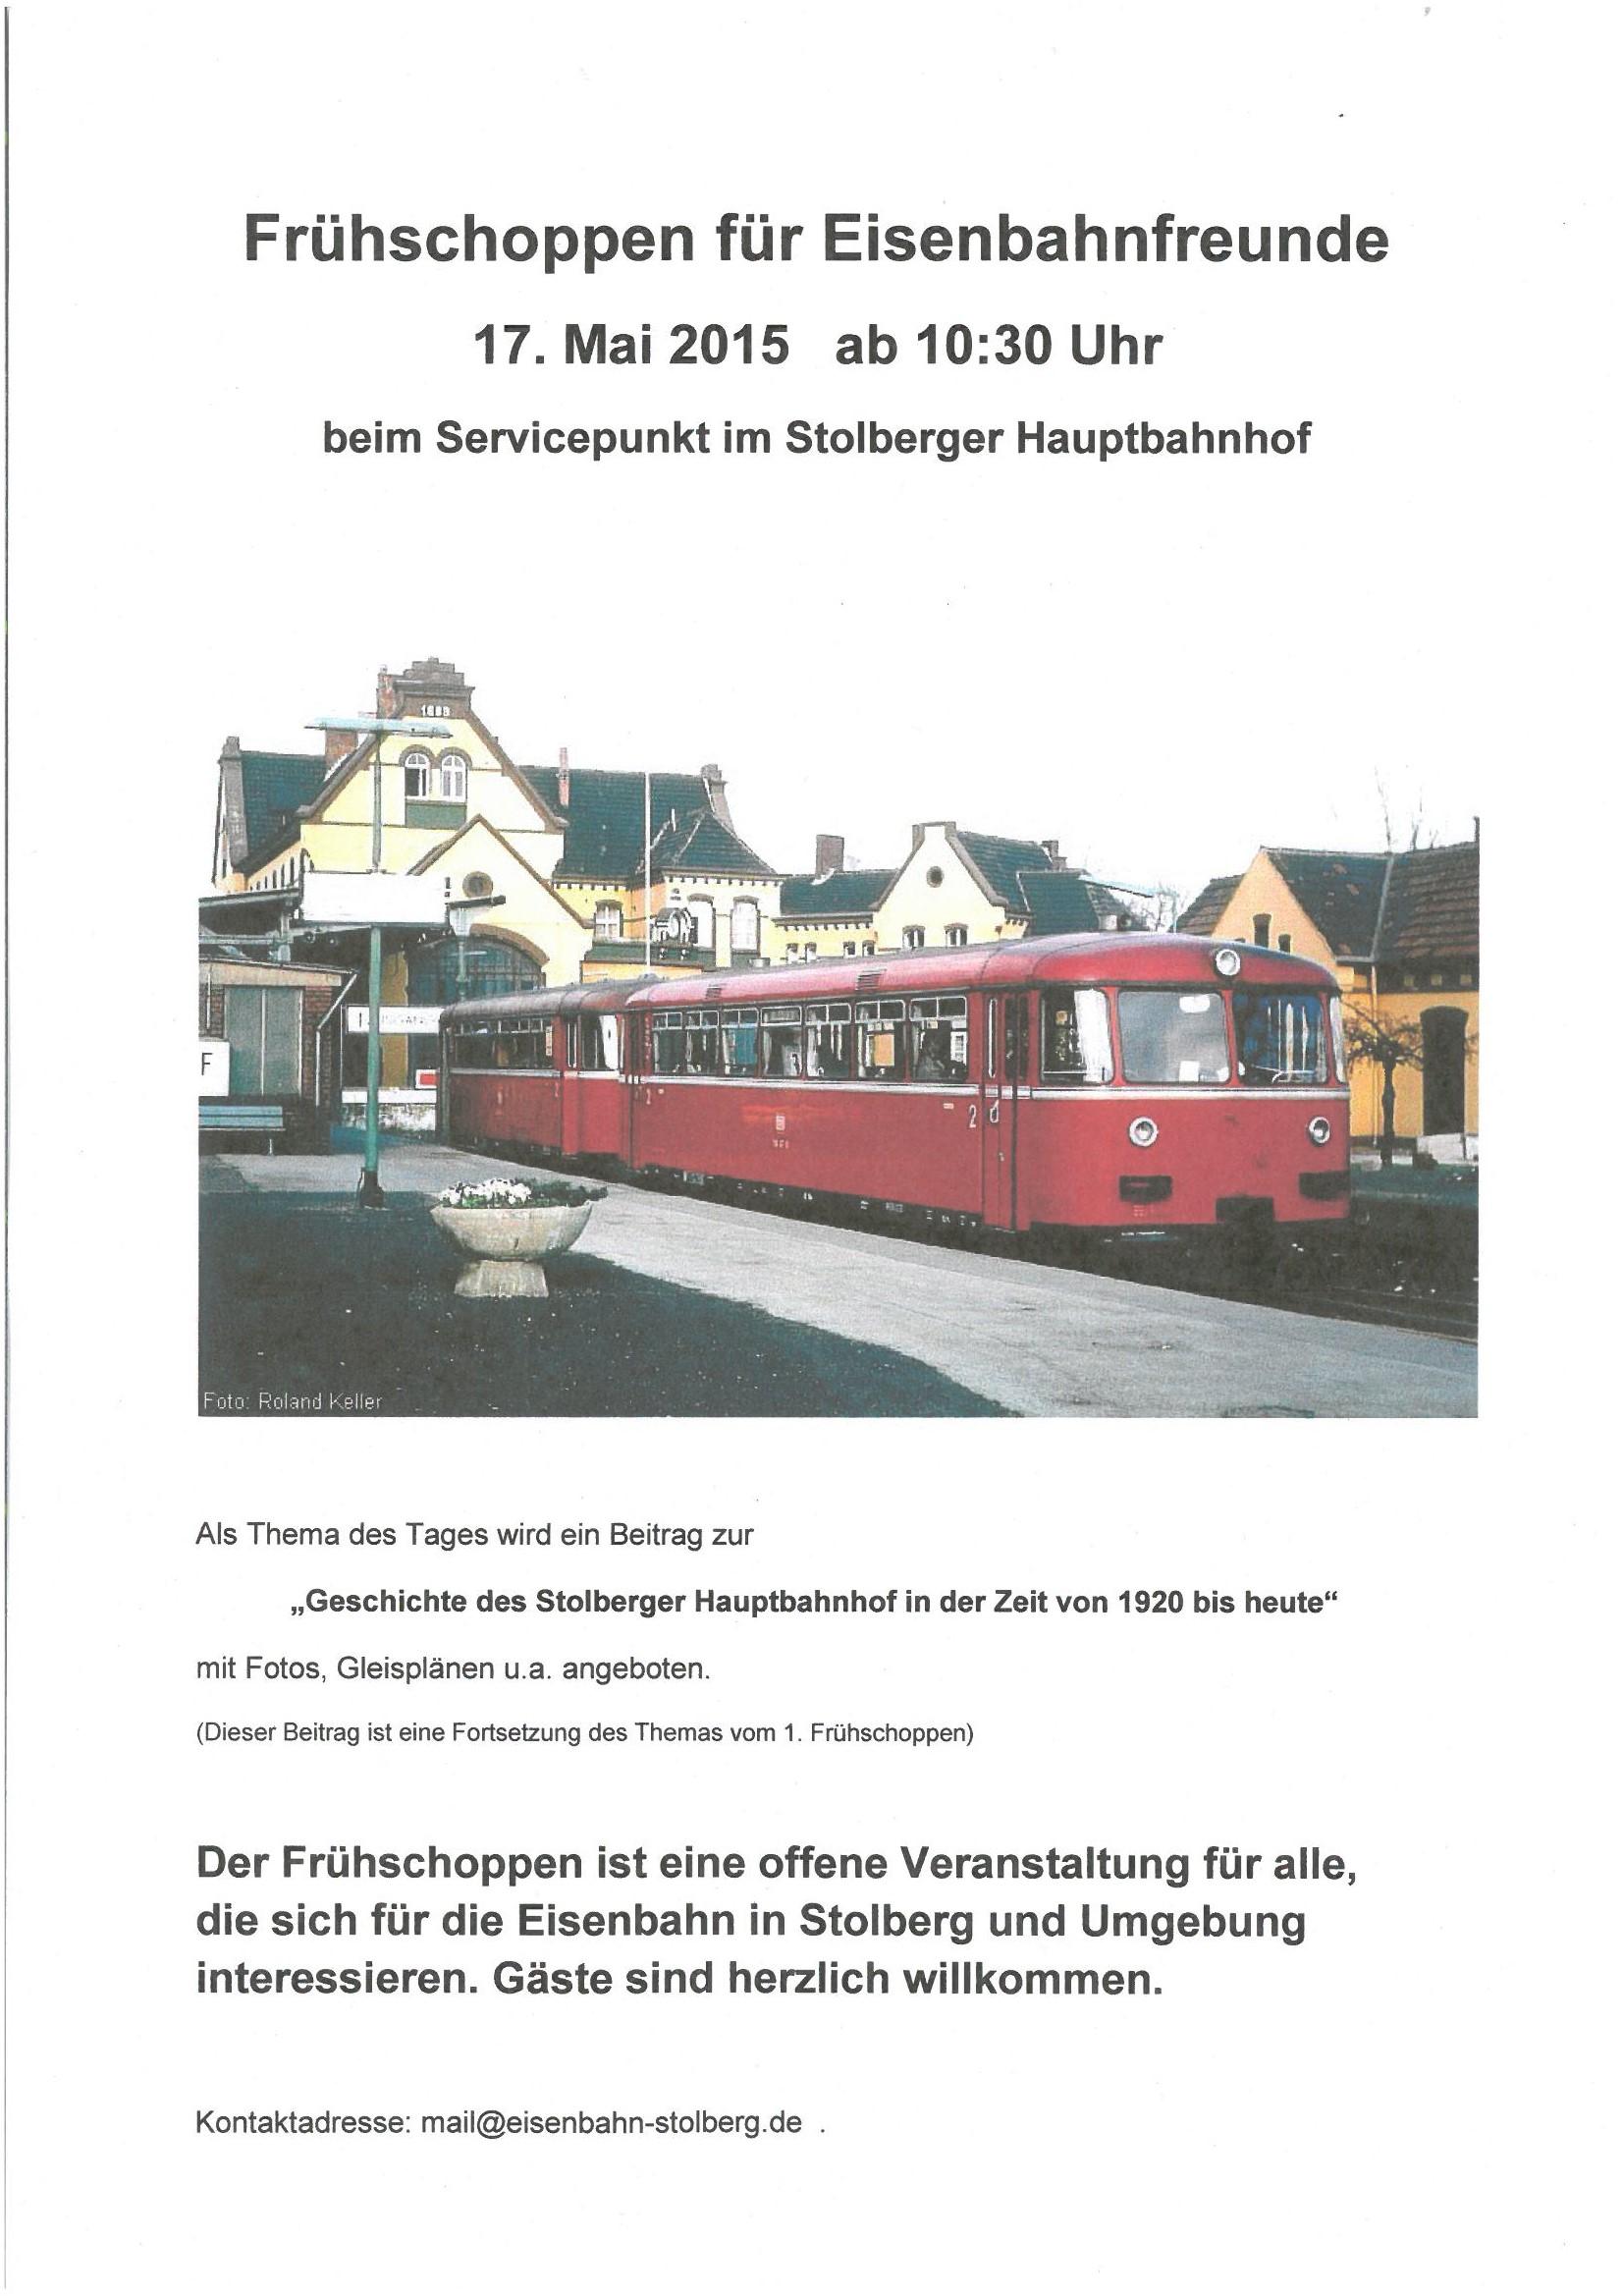 Einladung_3_Fruehschoppen_200dpi_